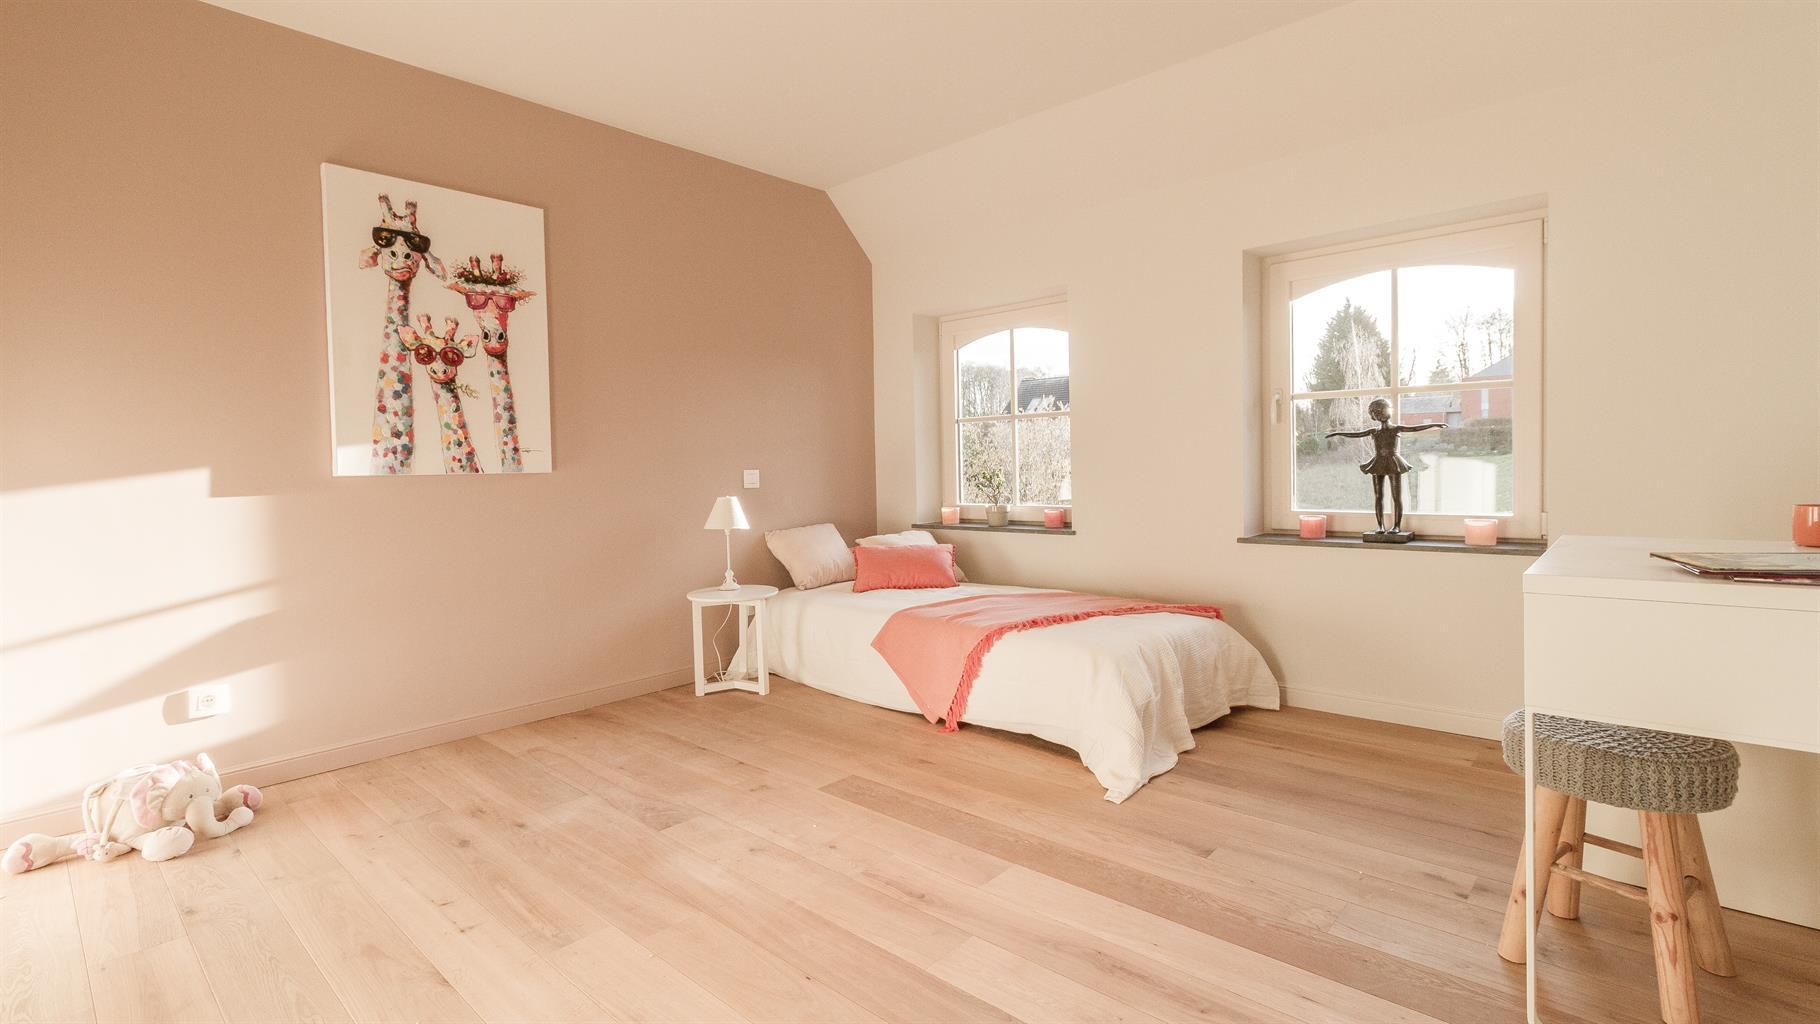 Maison - Dion-Valmont - #3963419-16